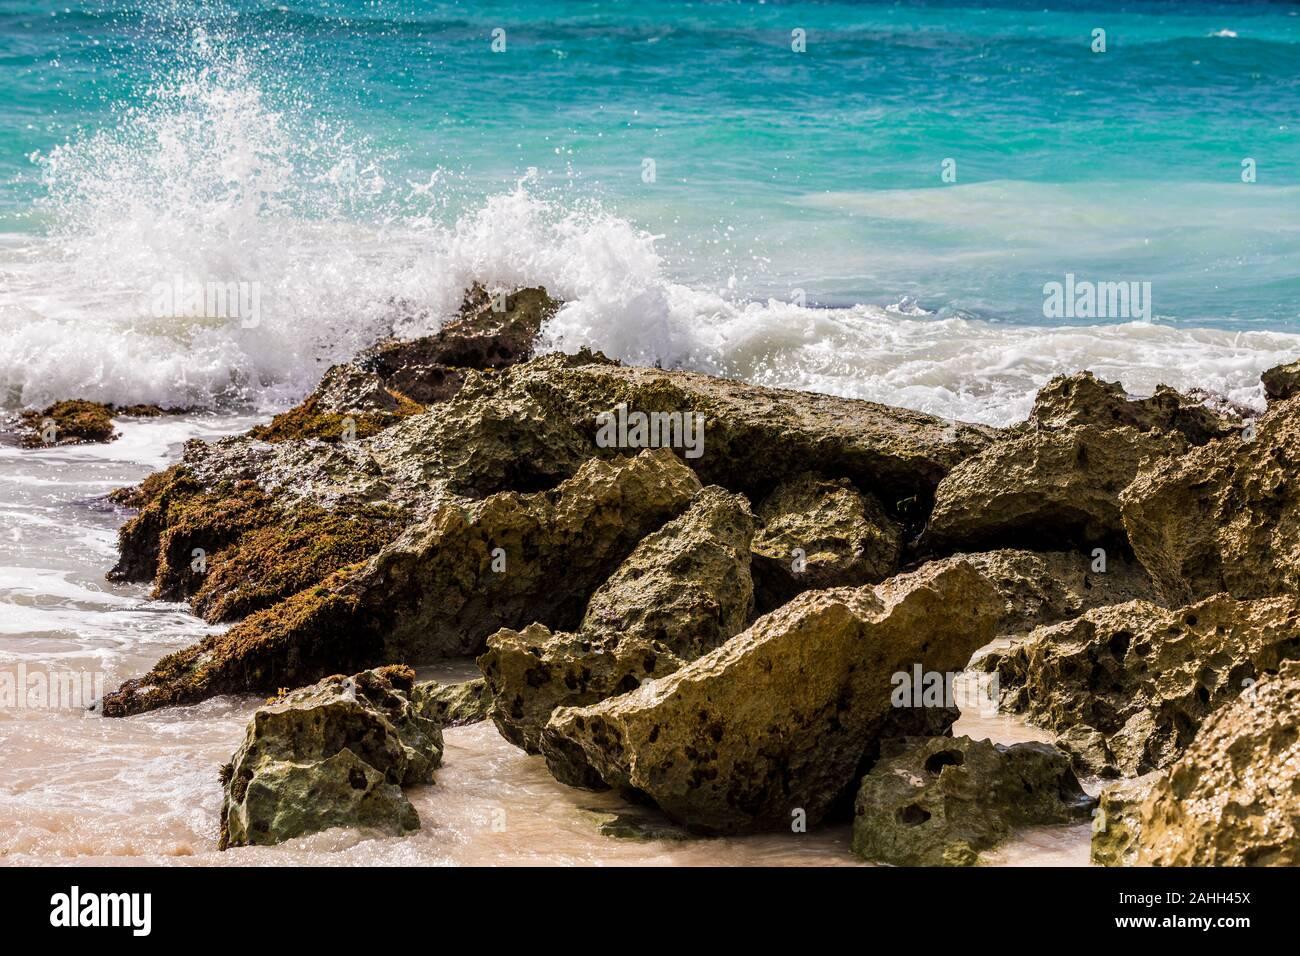 Waves crashing on a tropical beach in Barbados Stock Photo